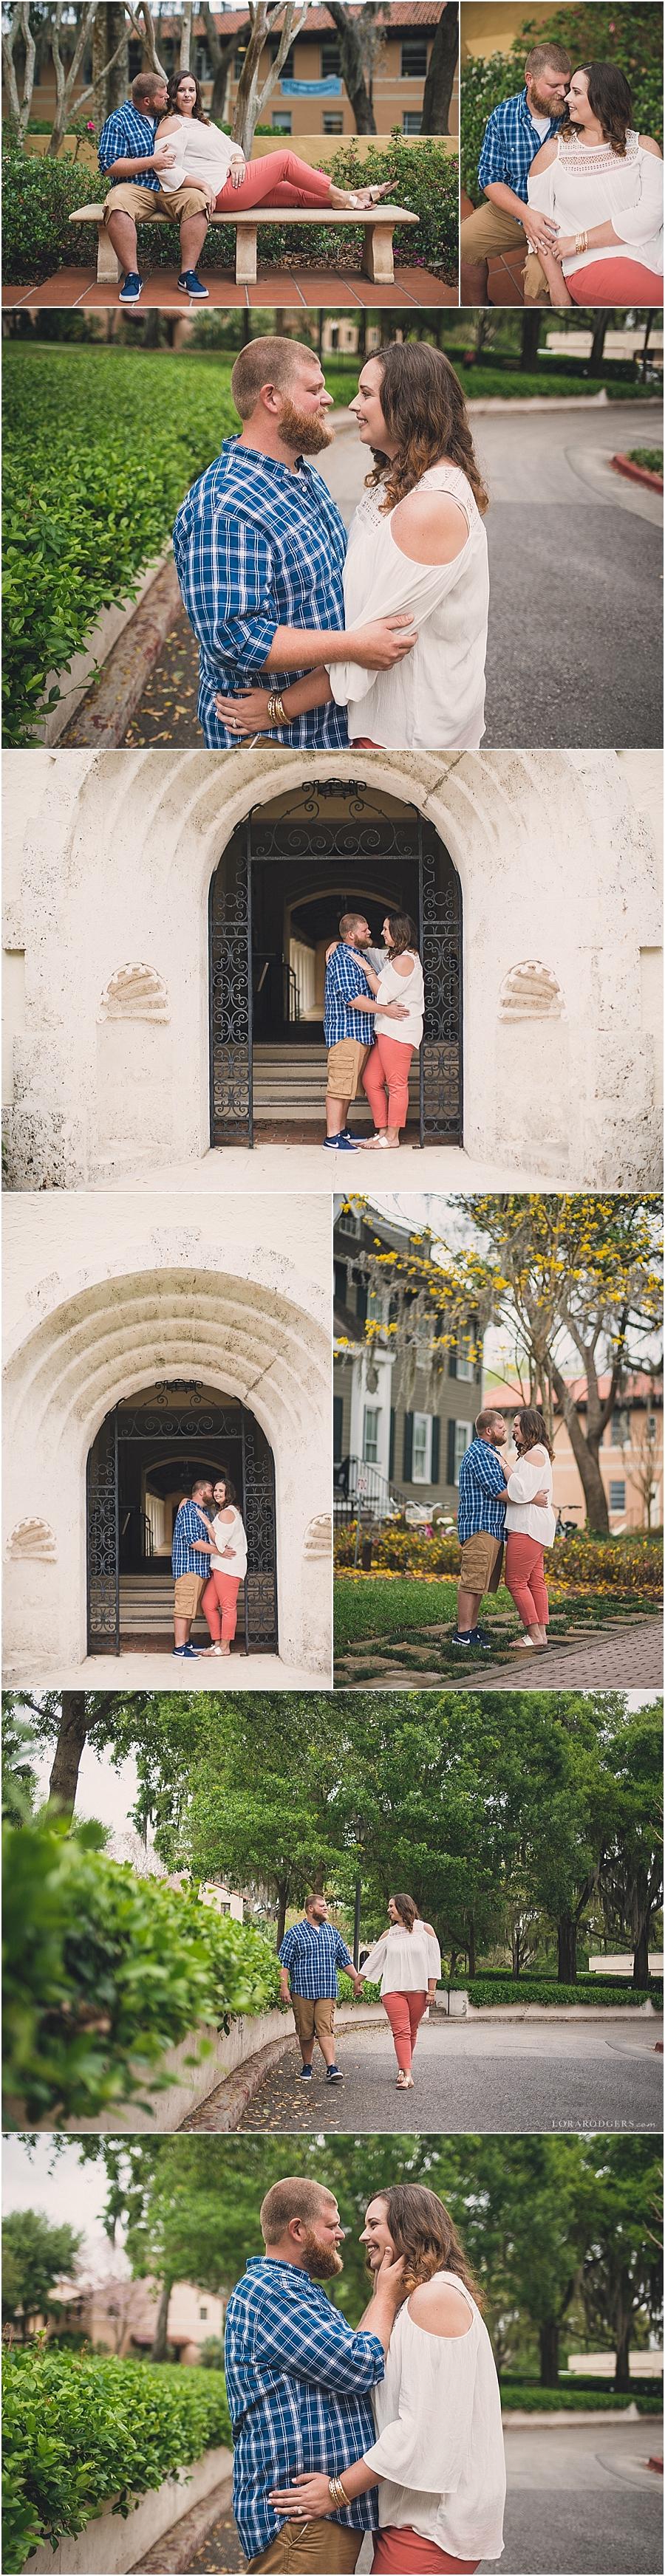 Rollins_College_Winter_Park_Florida_Engagement_002